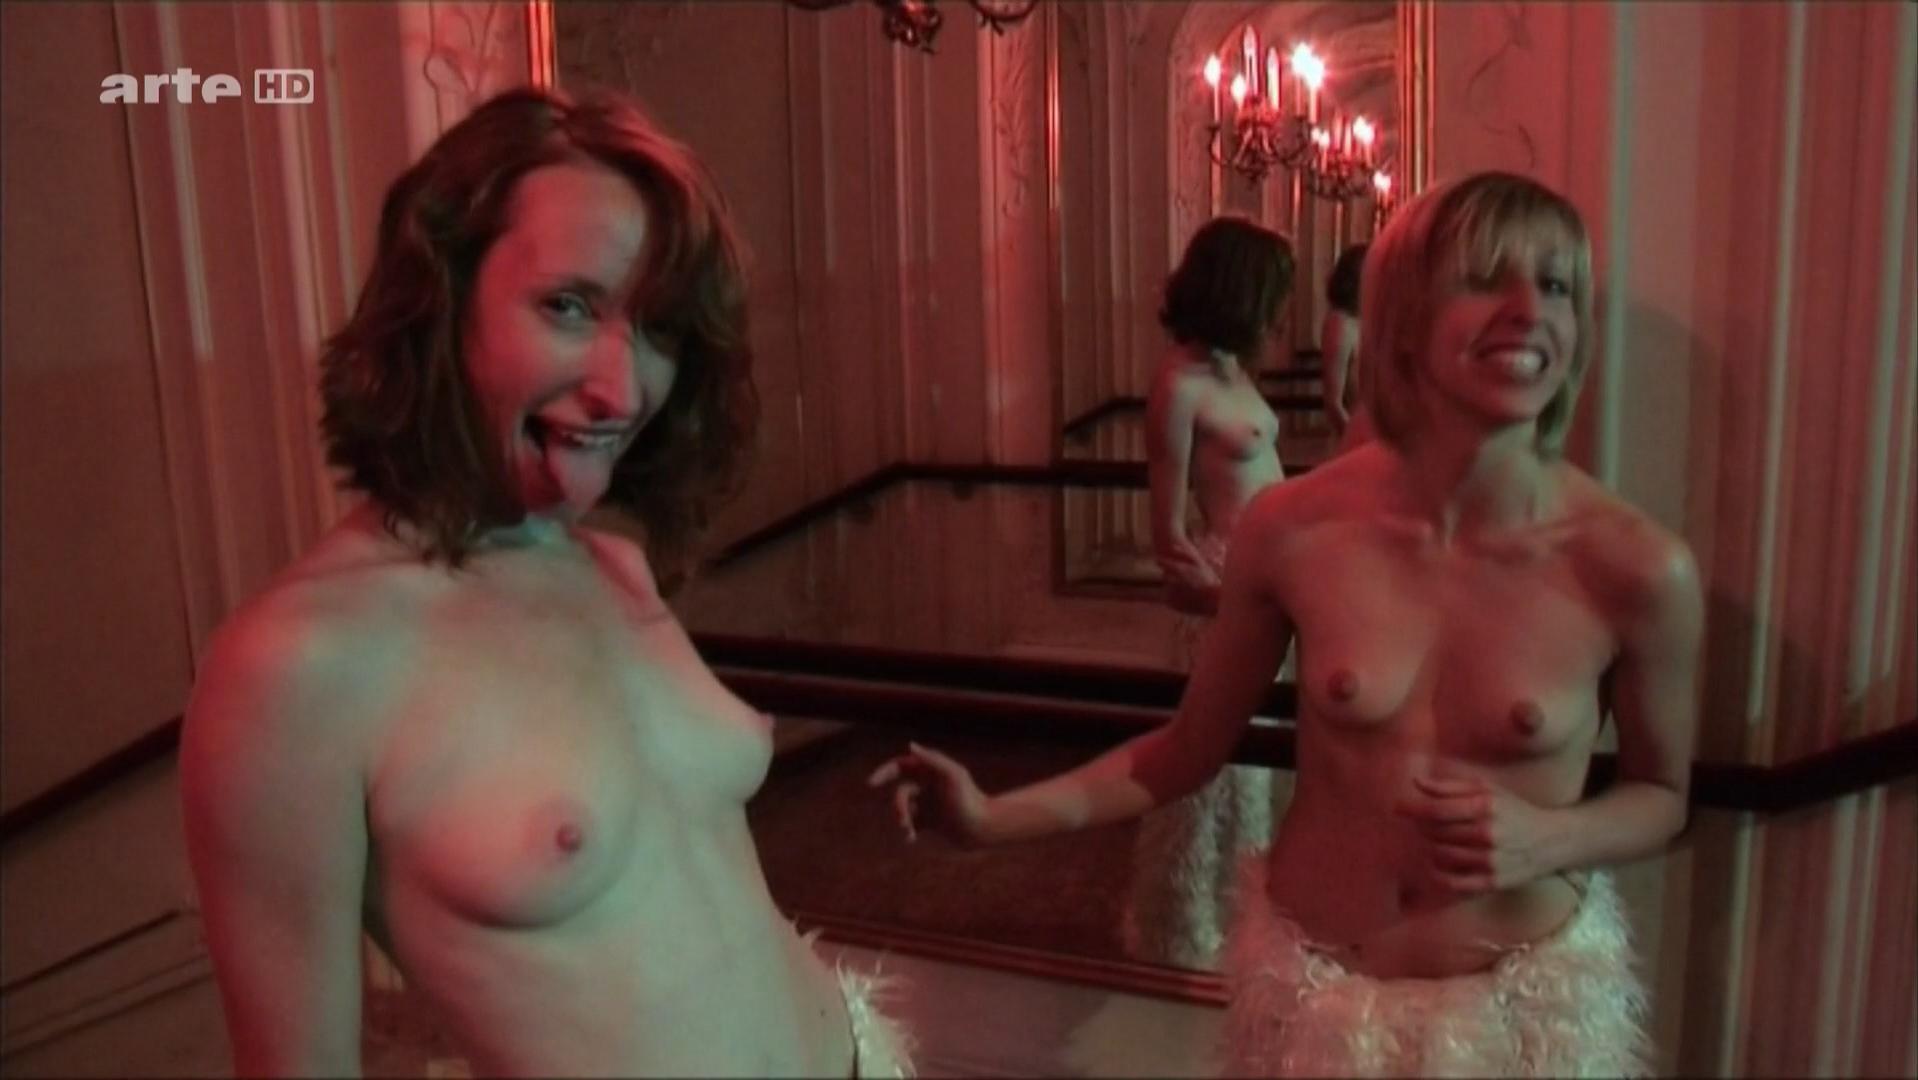 Stephanie Cumming nude, Katharina Meves nude, Anna Maria Nowak nude - Burning Palace (2009)